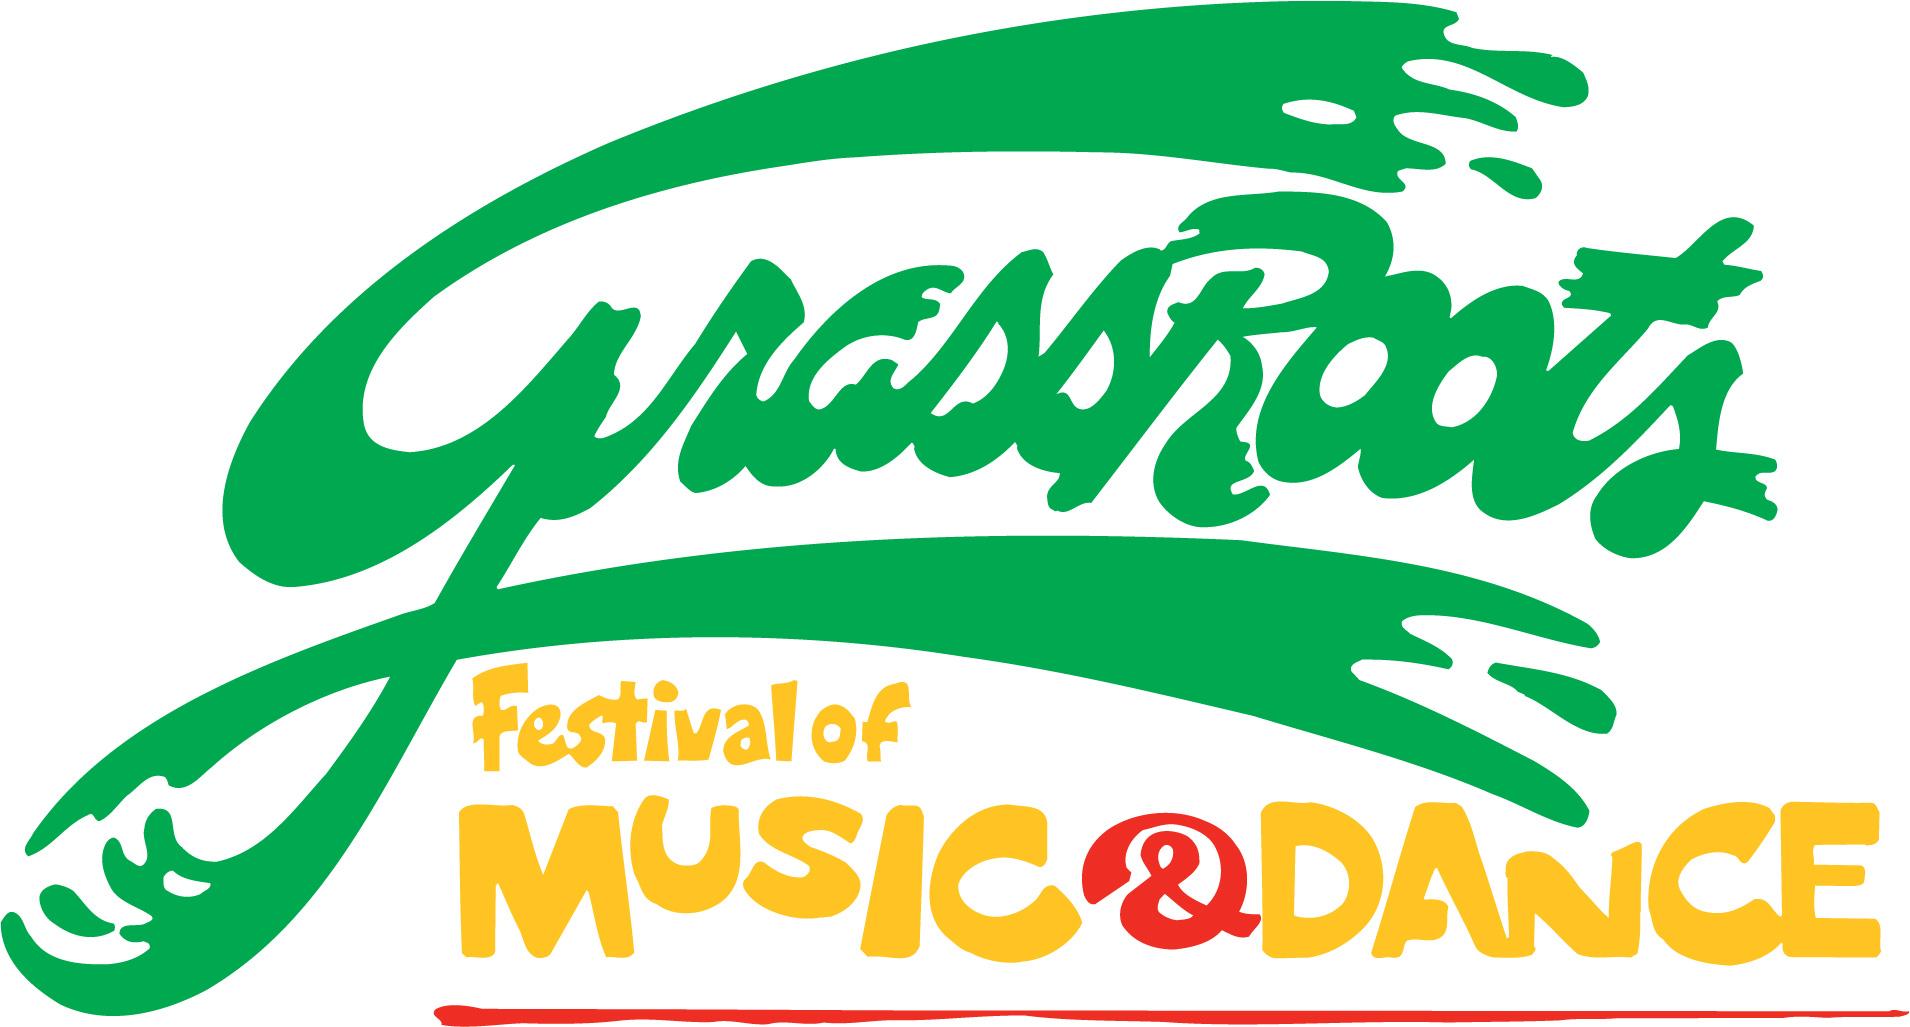 GRF_logo2.jpg